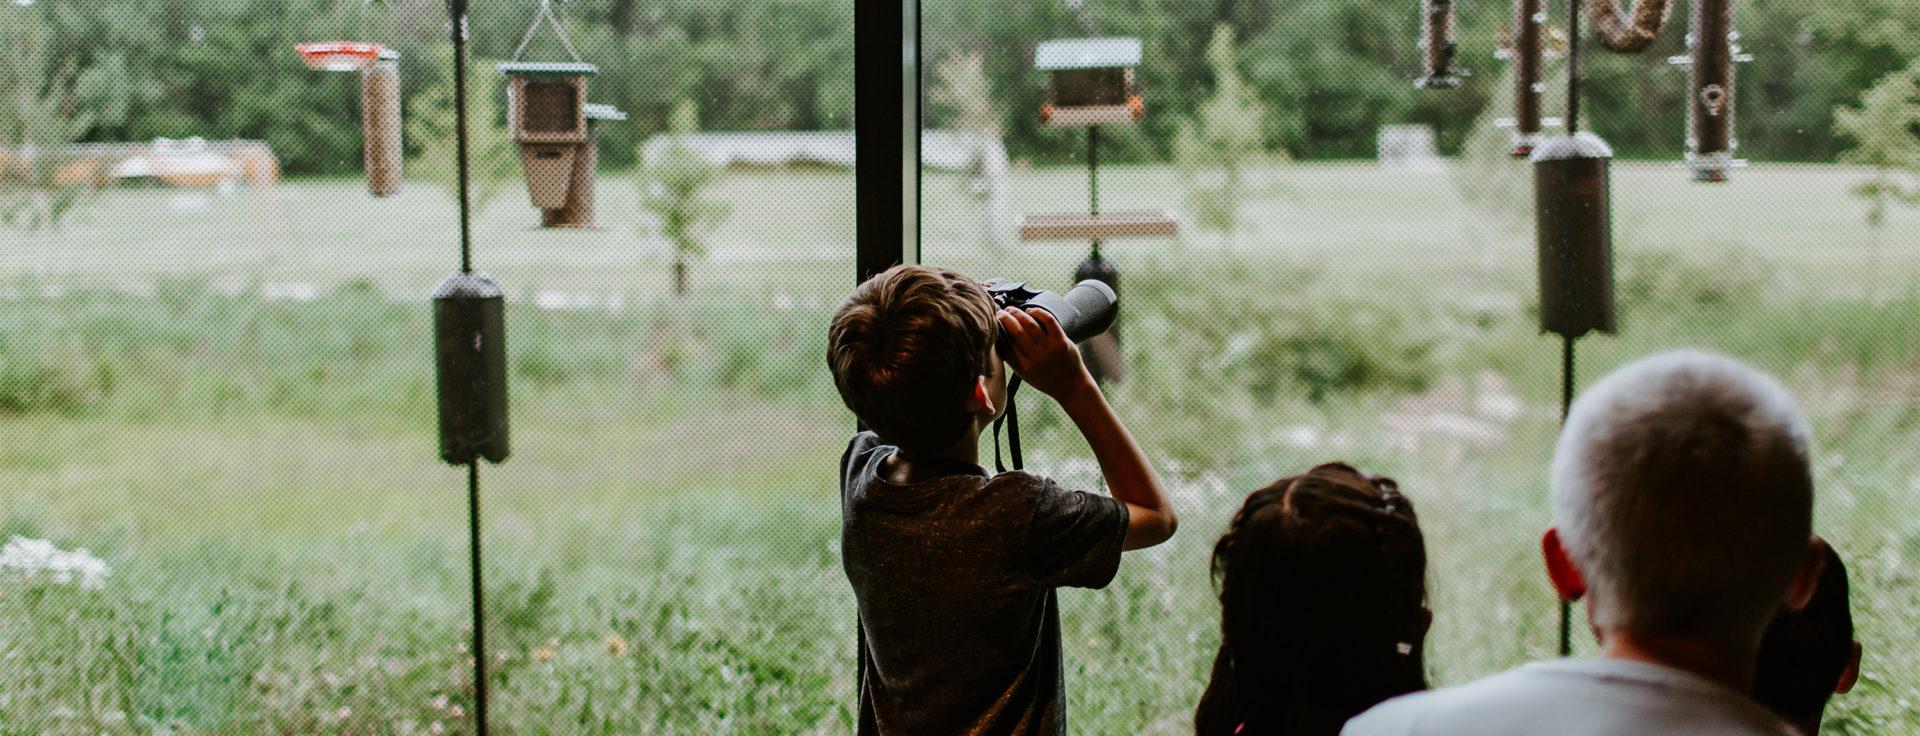 youth look through binoculars at bird feeders